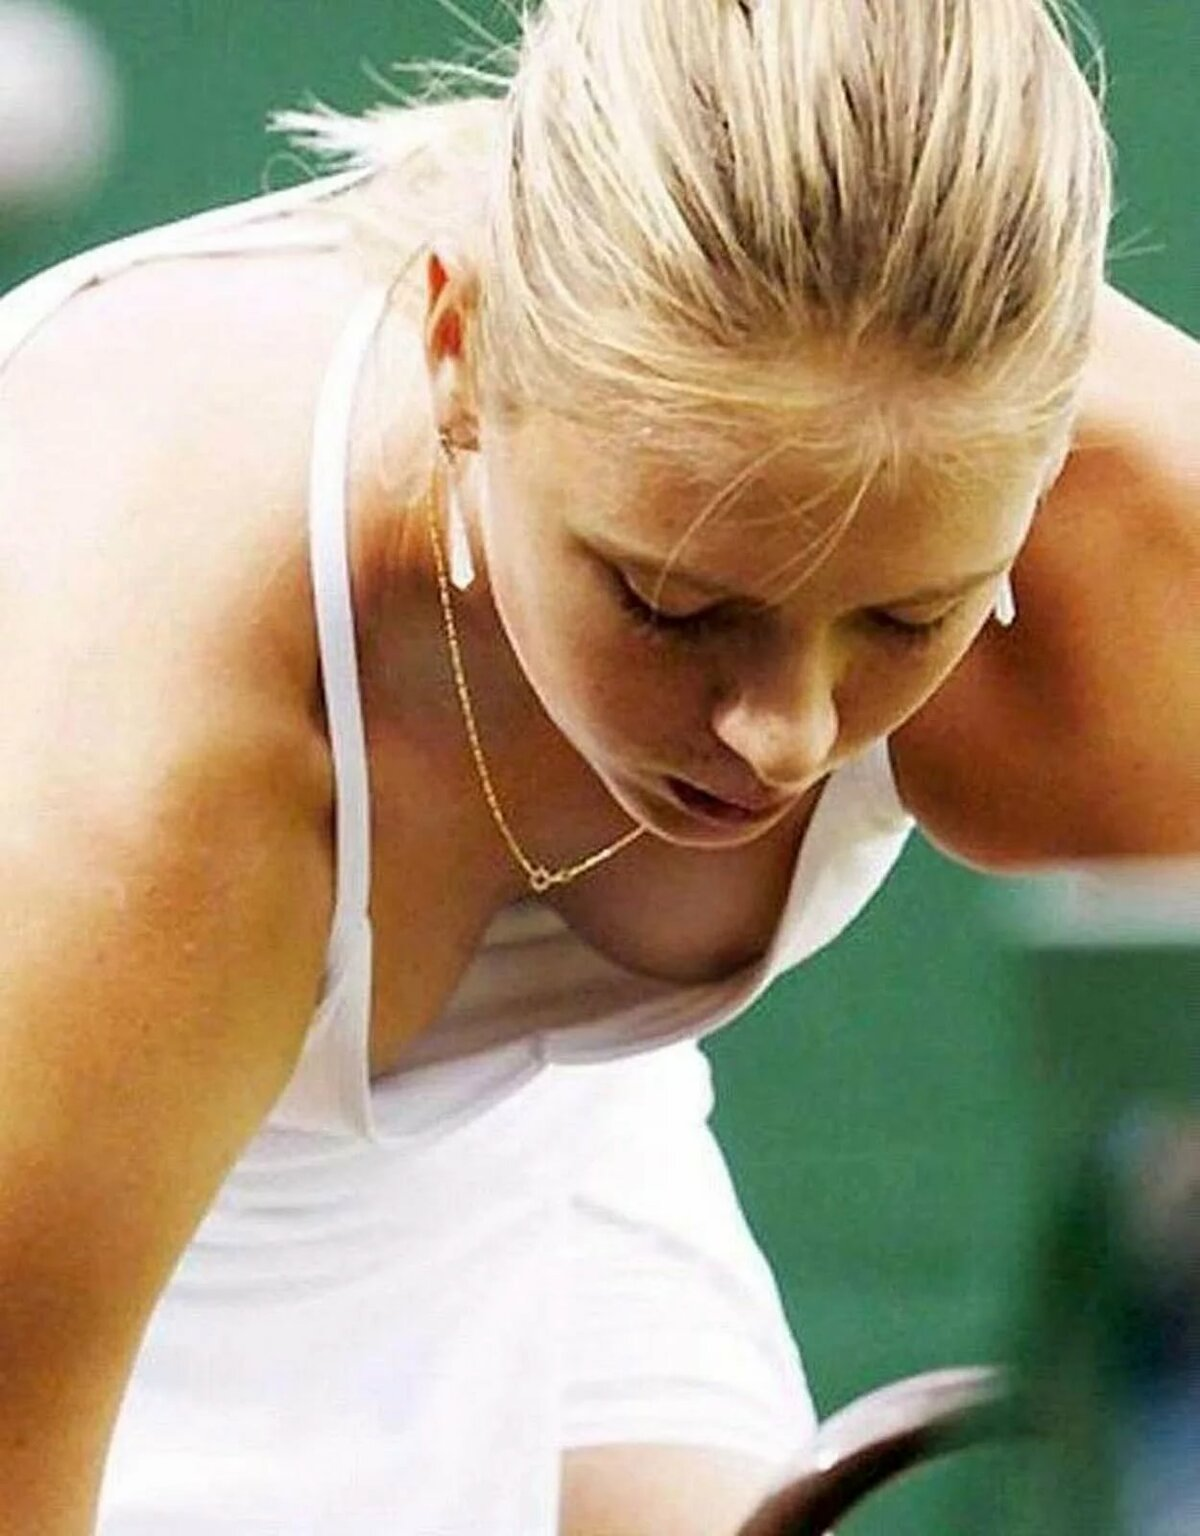 Tennis boob slips